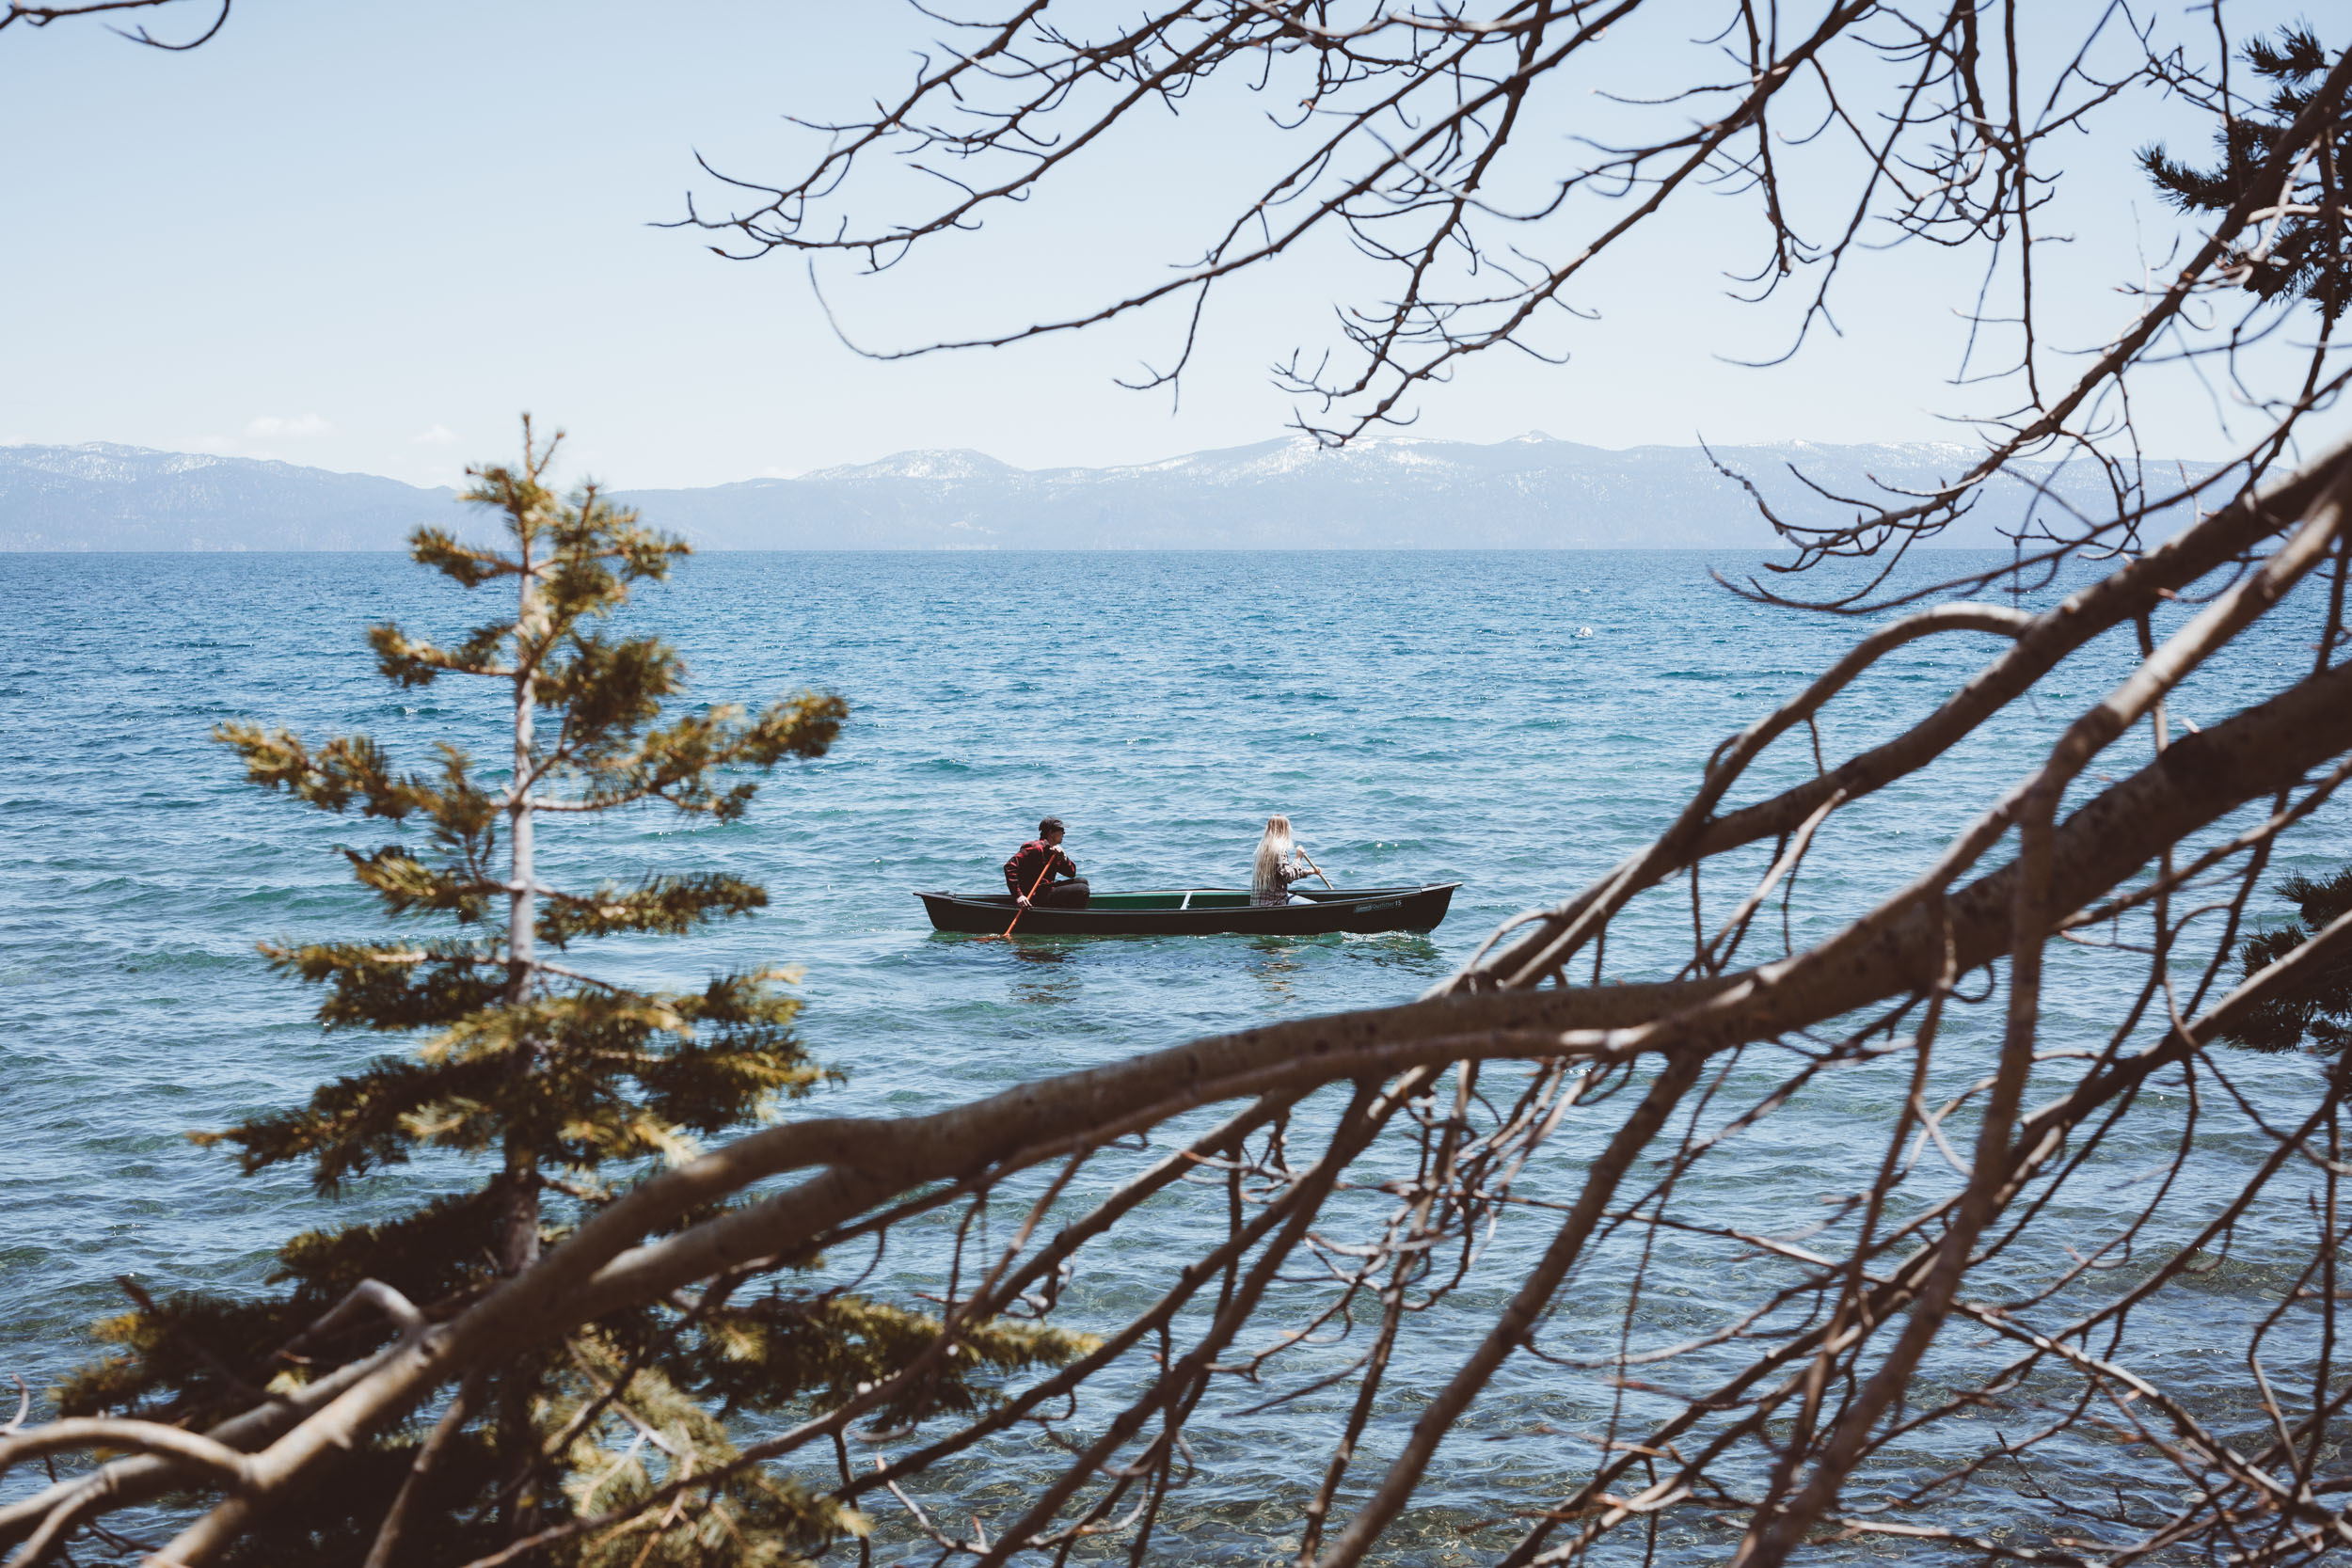 west-shore-adventure-canoe-hike-and-shoot-1.jpg